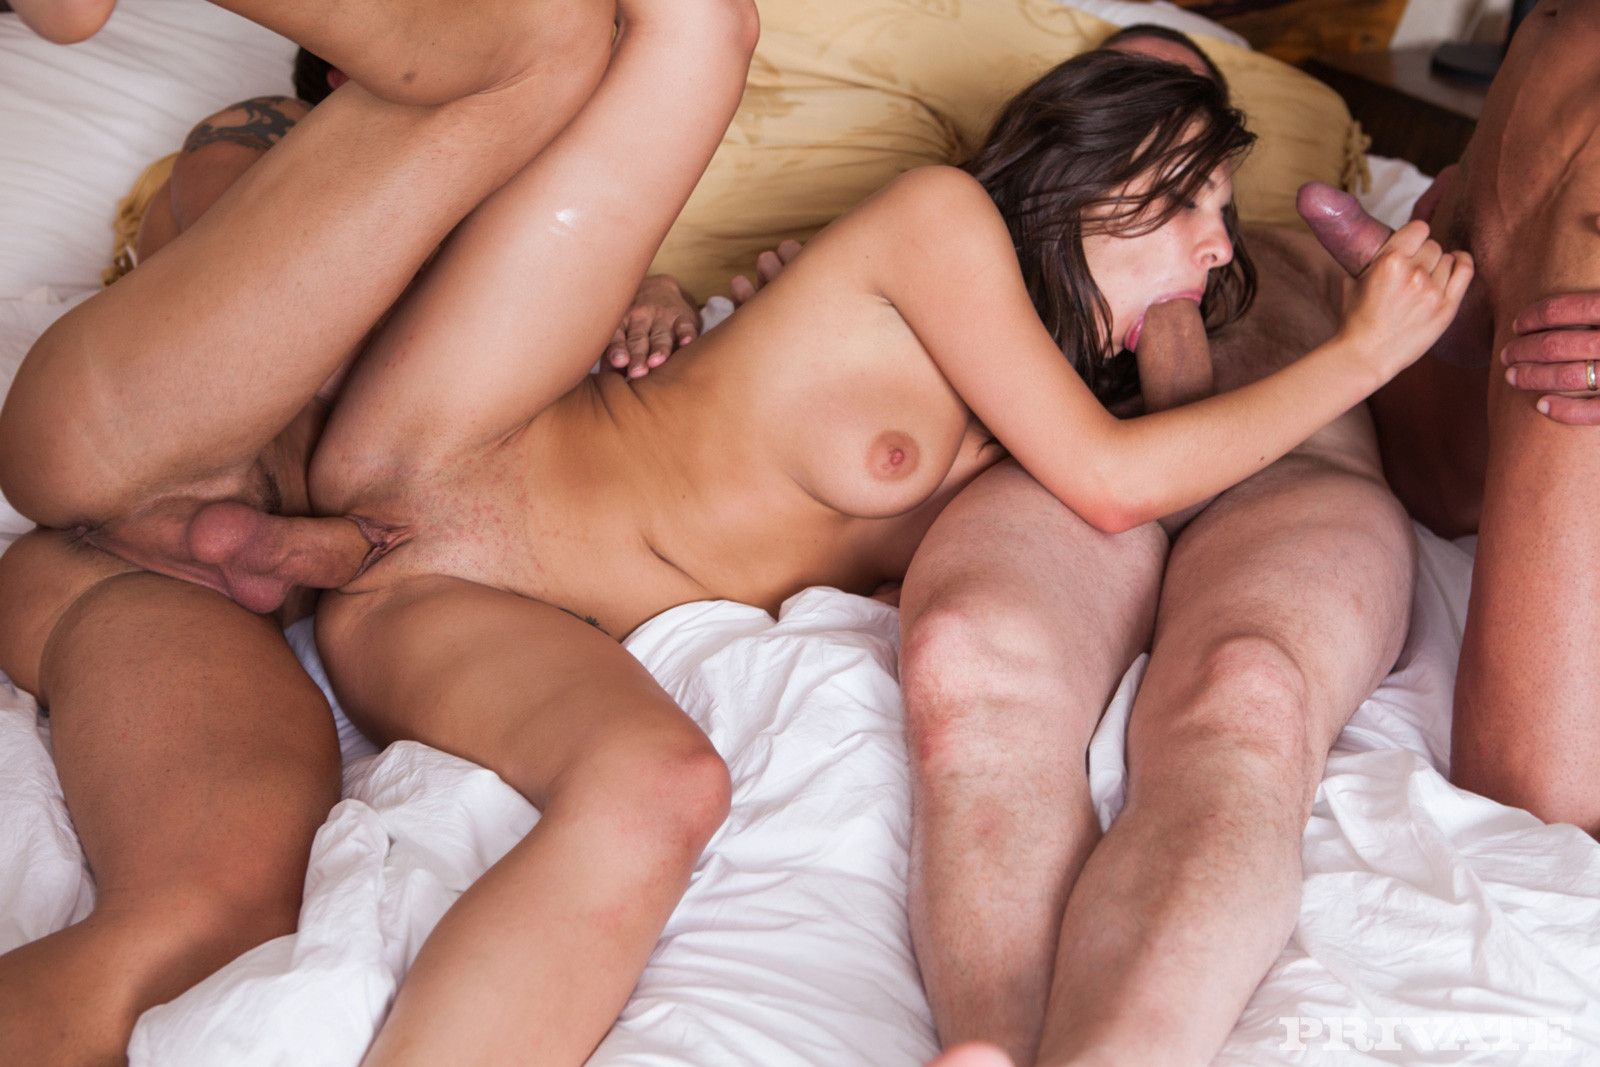 это видео секса жена дала троим стало глубже